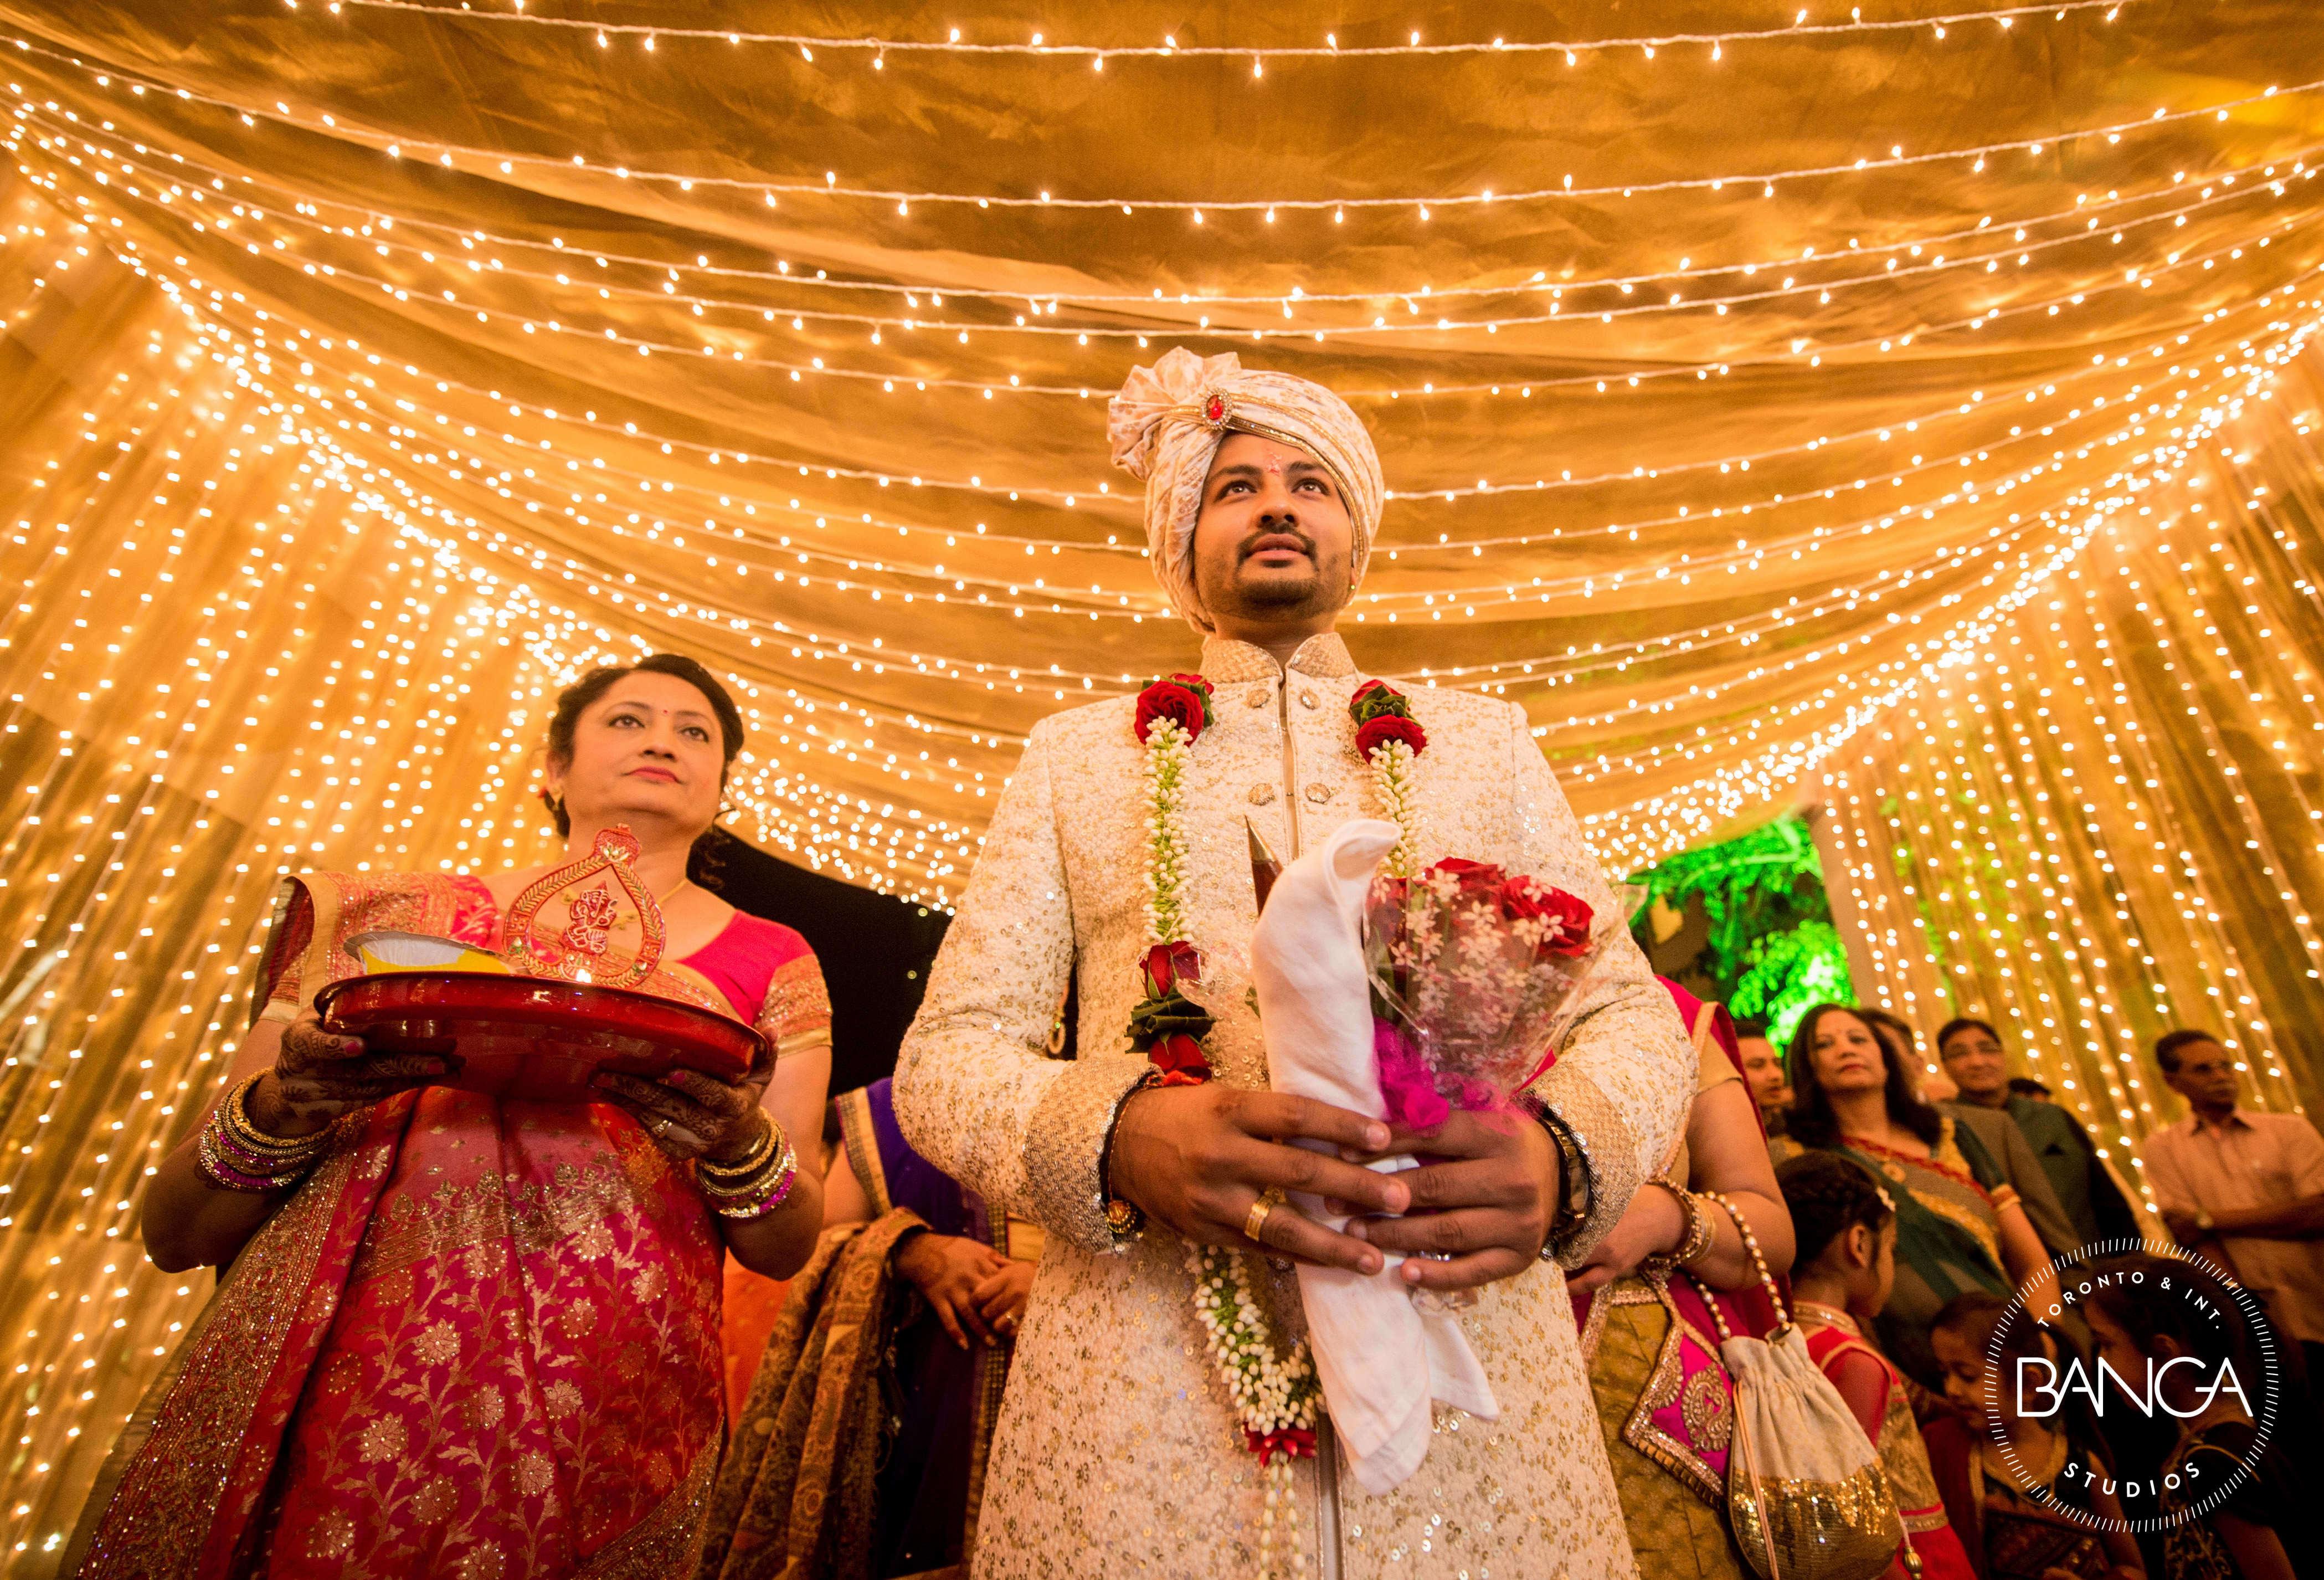 the groom entry!:anita dongre timeless, shyamal and bhumika, anushree reddy, banga studios